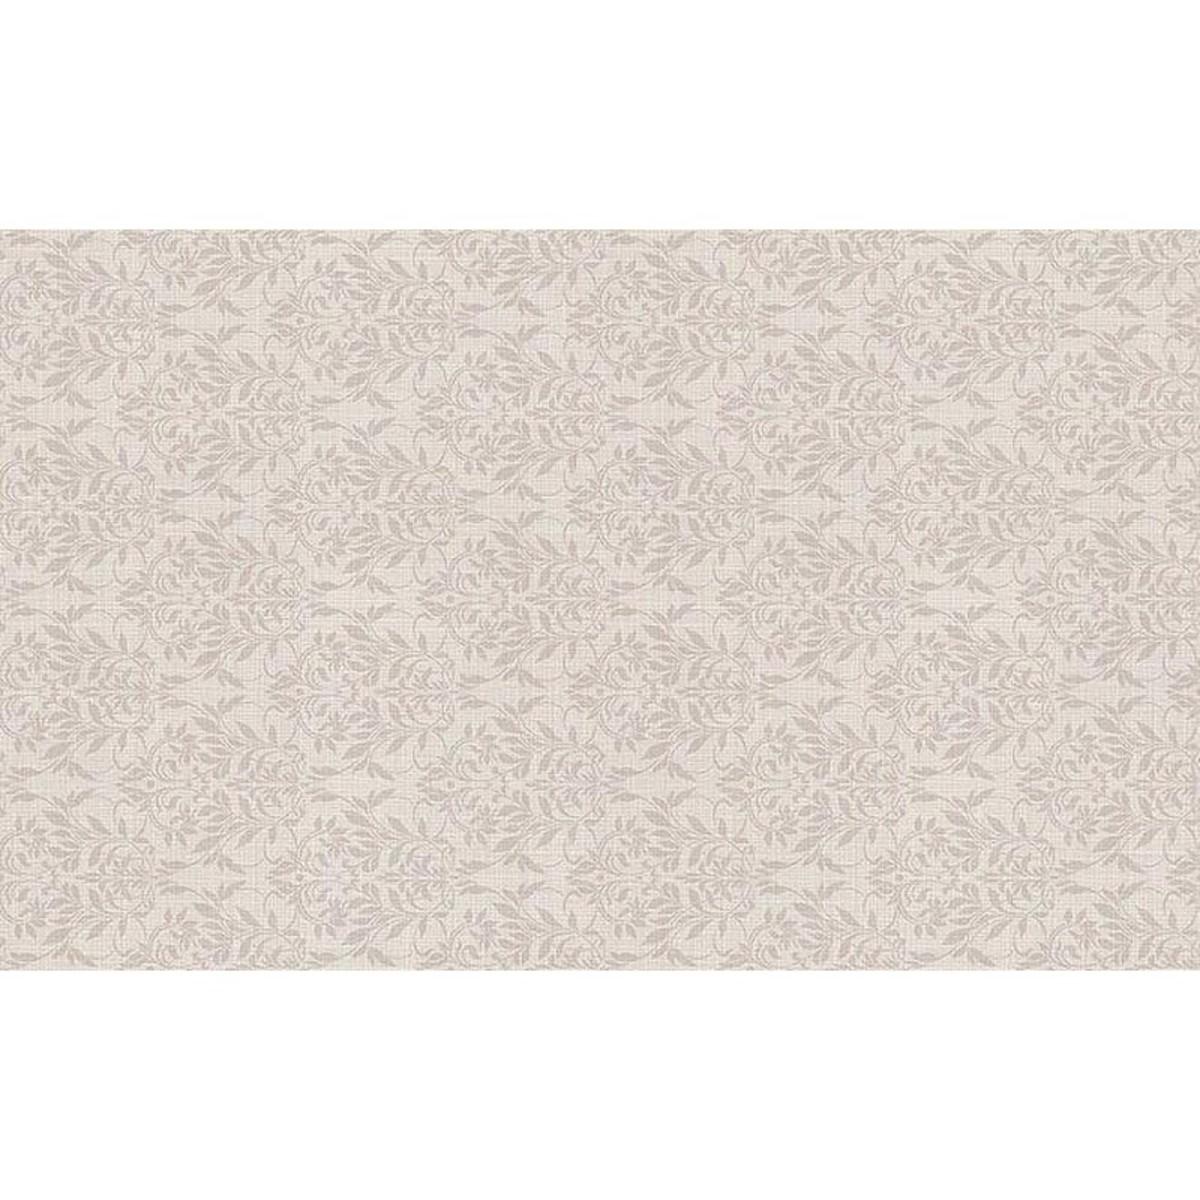 Плитка настенная Дарлингтон орнамент 2 25х40 см 11 м2